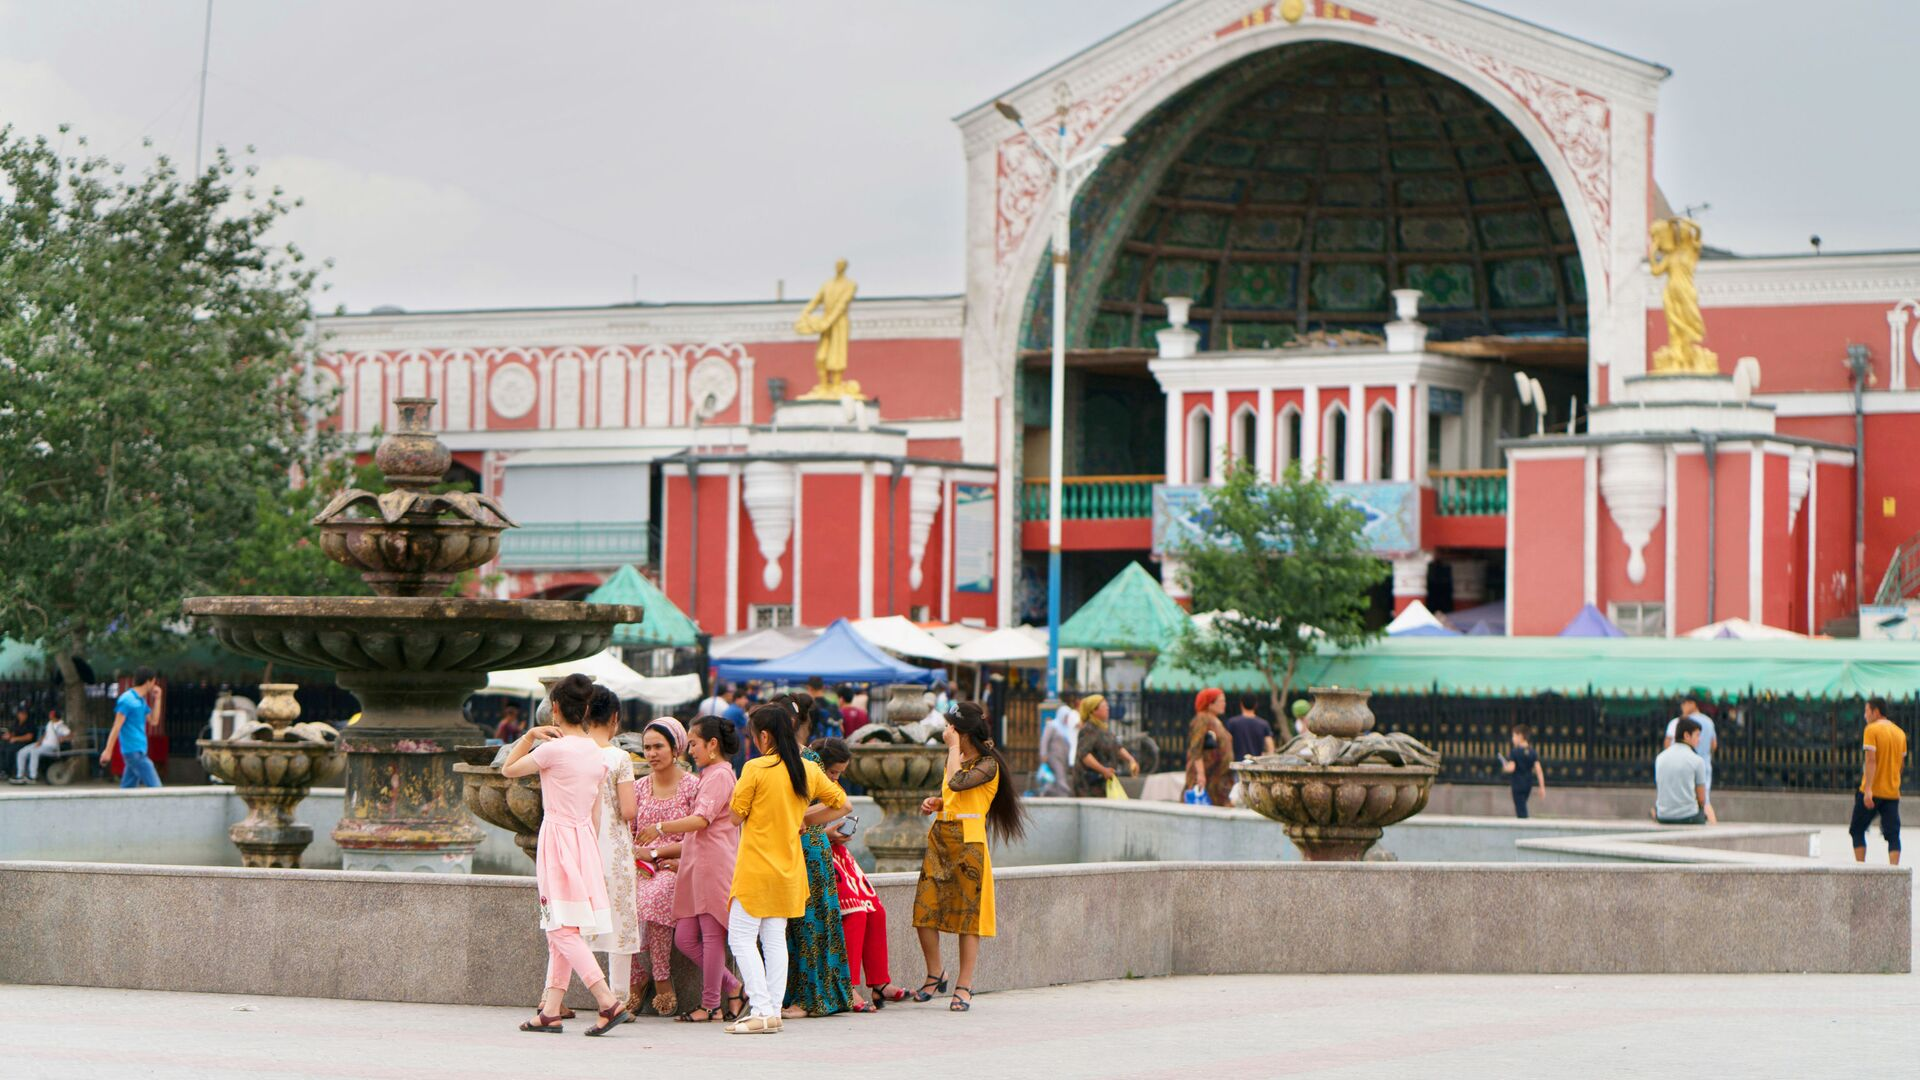 Жители города Худжанд на площади Регистан перед городским рынком Панчанбе - Sputnik Таджикистан, 1920, 29.07.2021